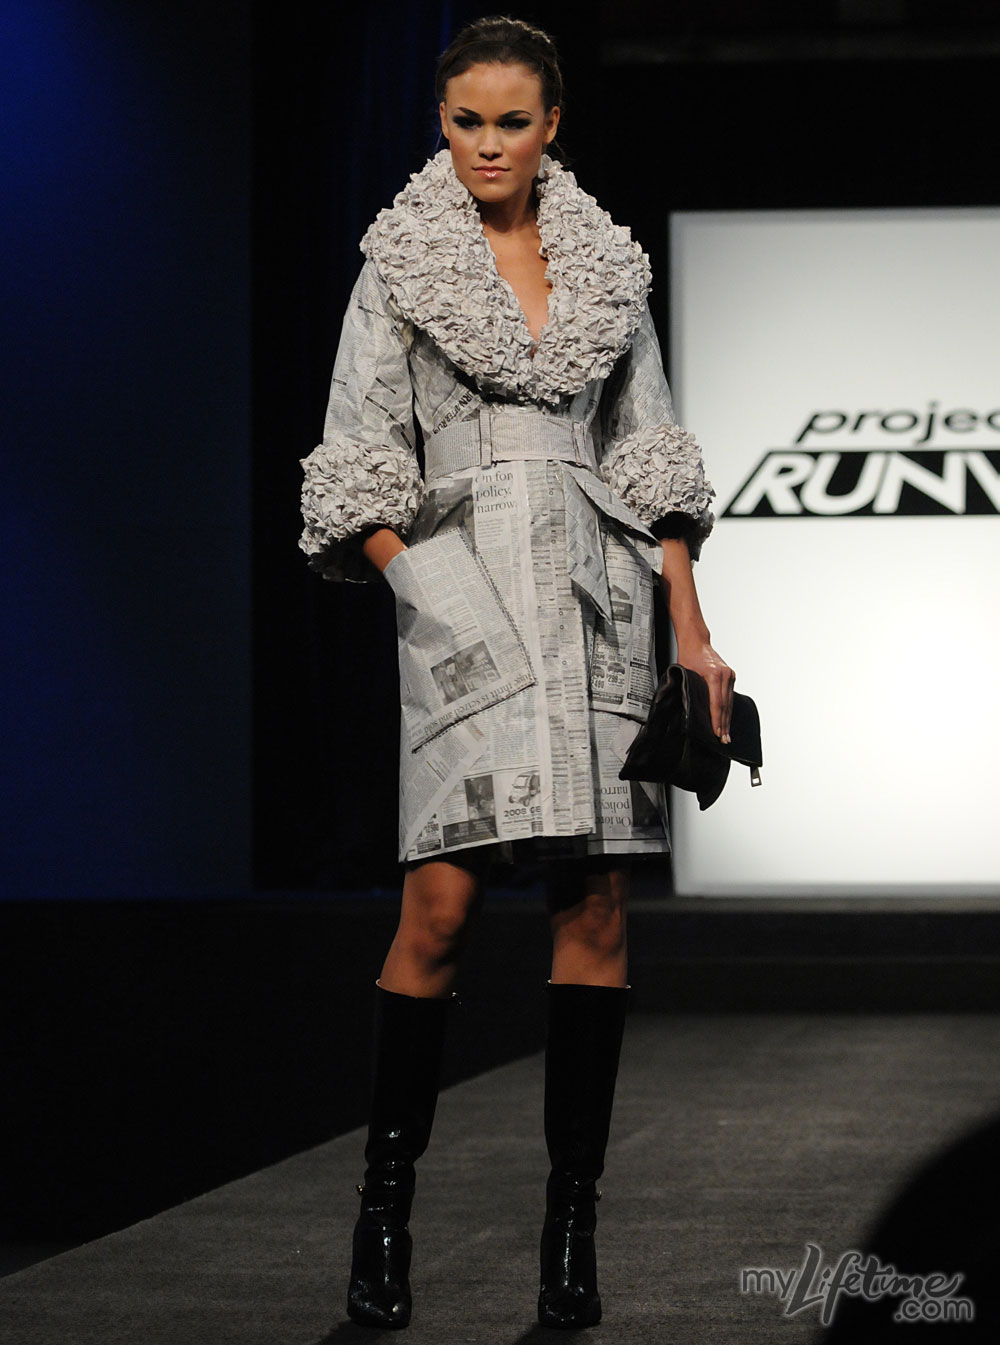 Project Runway Episode 5: Paper!